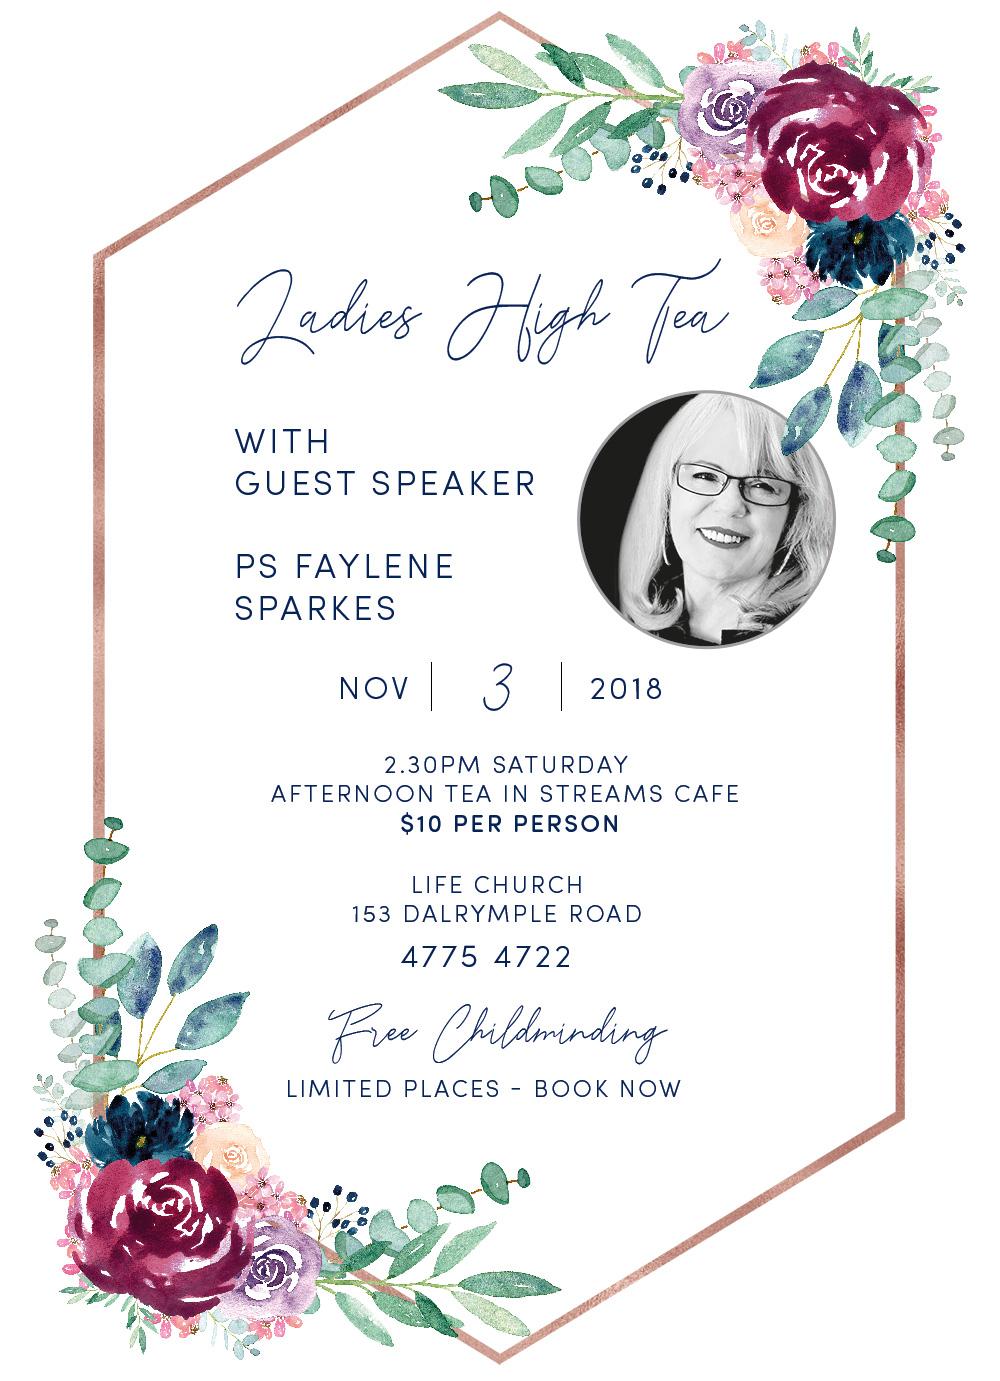 Ladies-High-tea-with-Faylene-edited-2-web-flyer.jpg